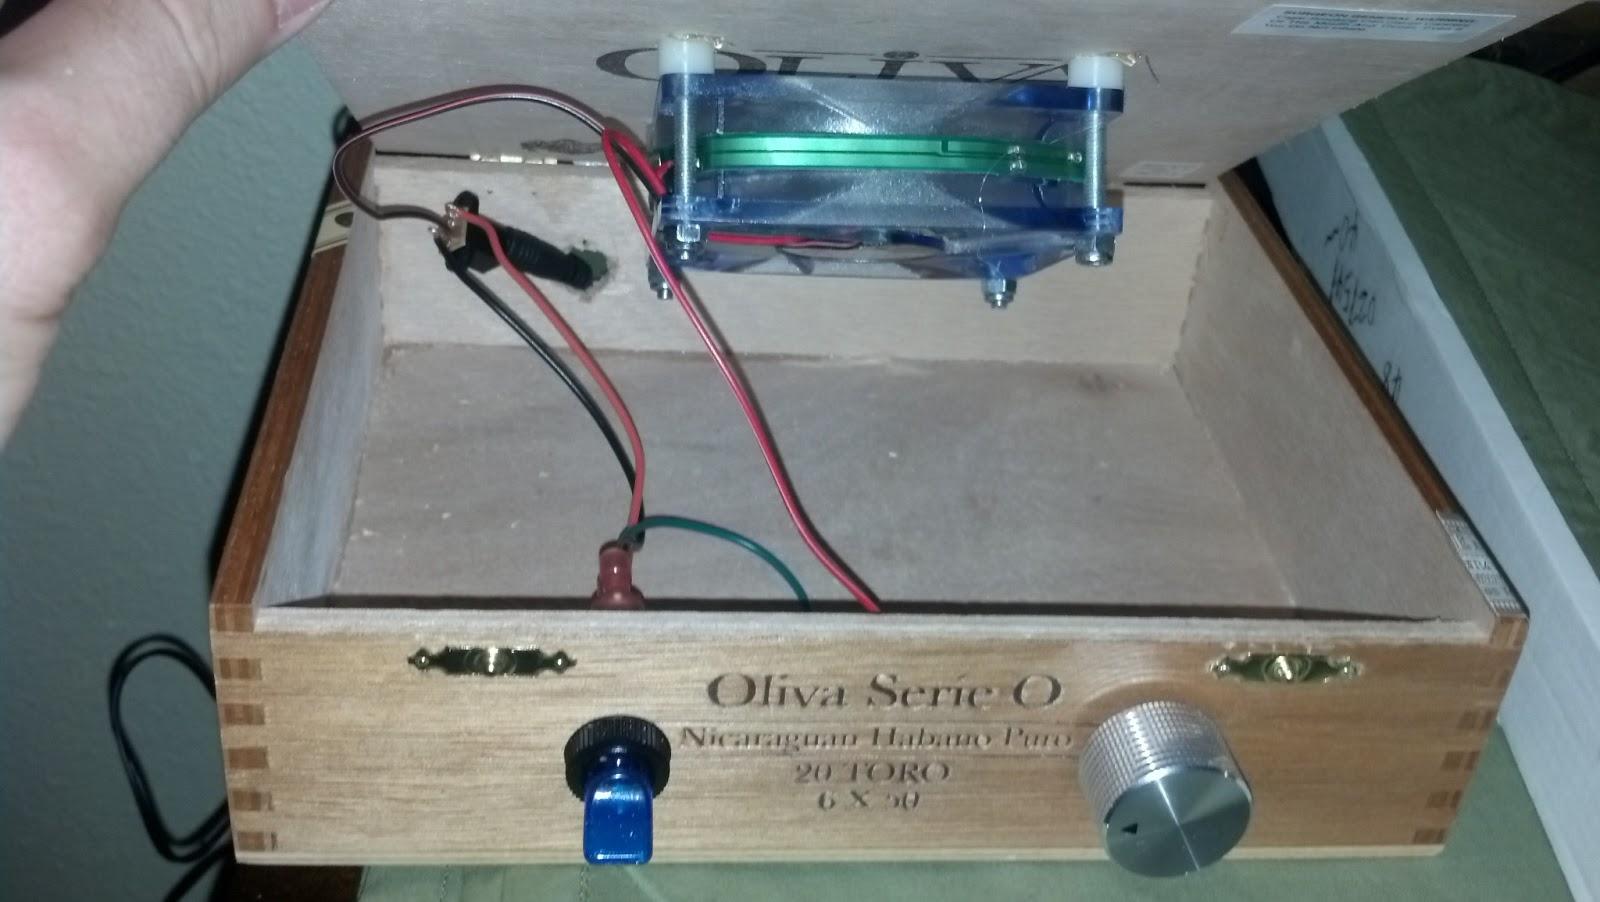 Diy Stir Plate Wiring Diagram 94 Ford Bronco Stereo Fermentology